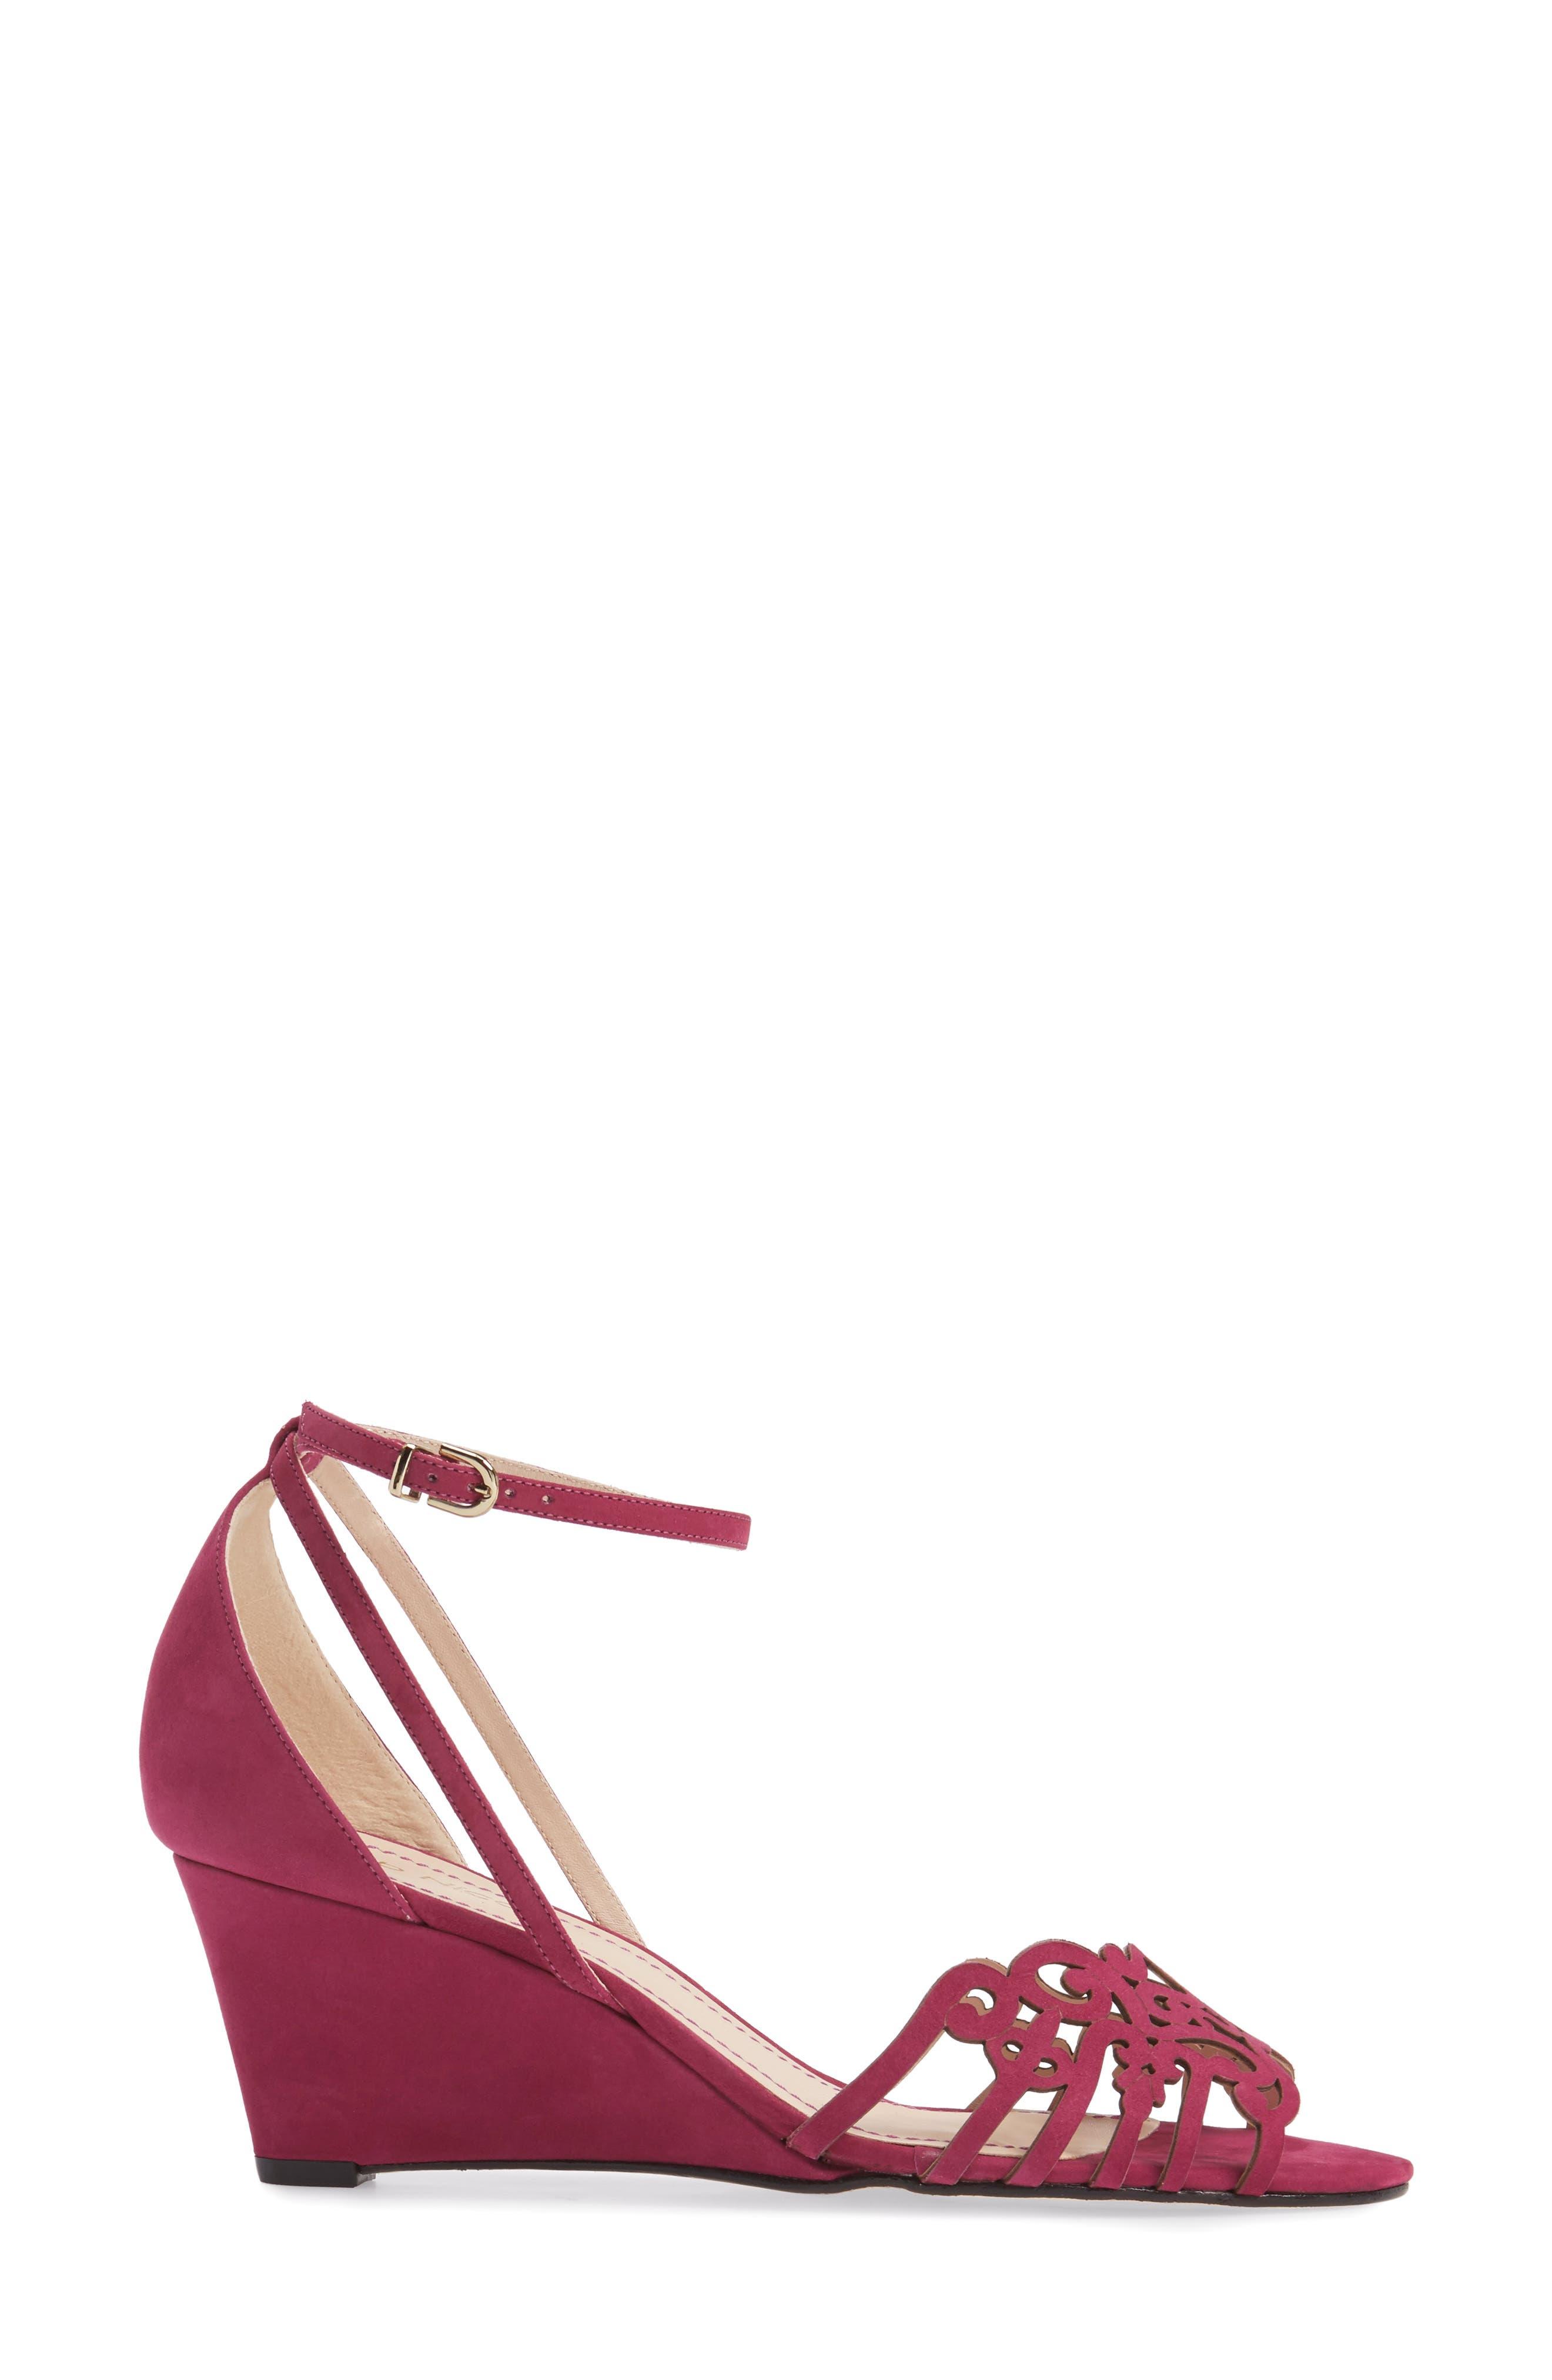 'Kingston' Ankle Strap Wedge Sandal,                             Alternate thumbnail 3, color,                             MAGENTA LEATHER